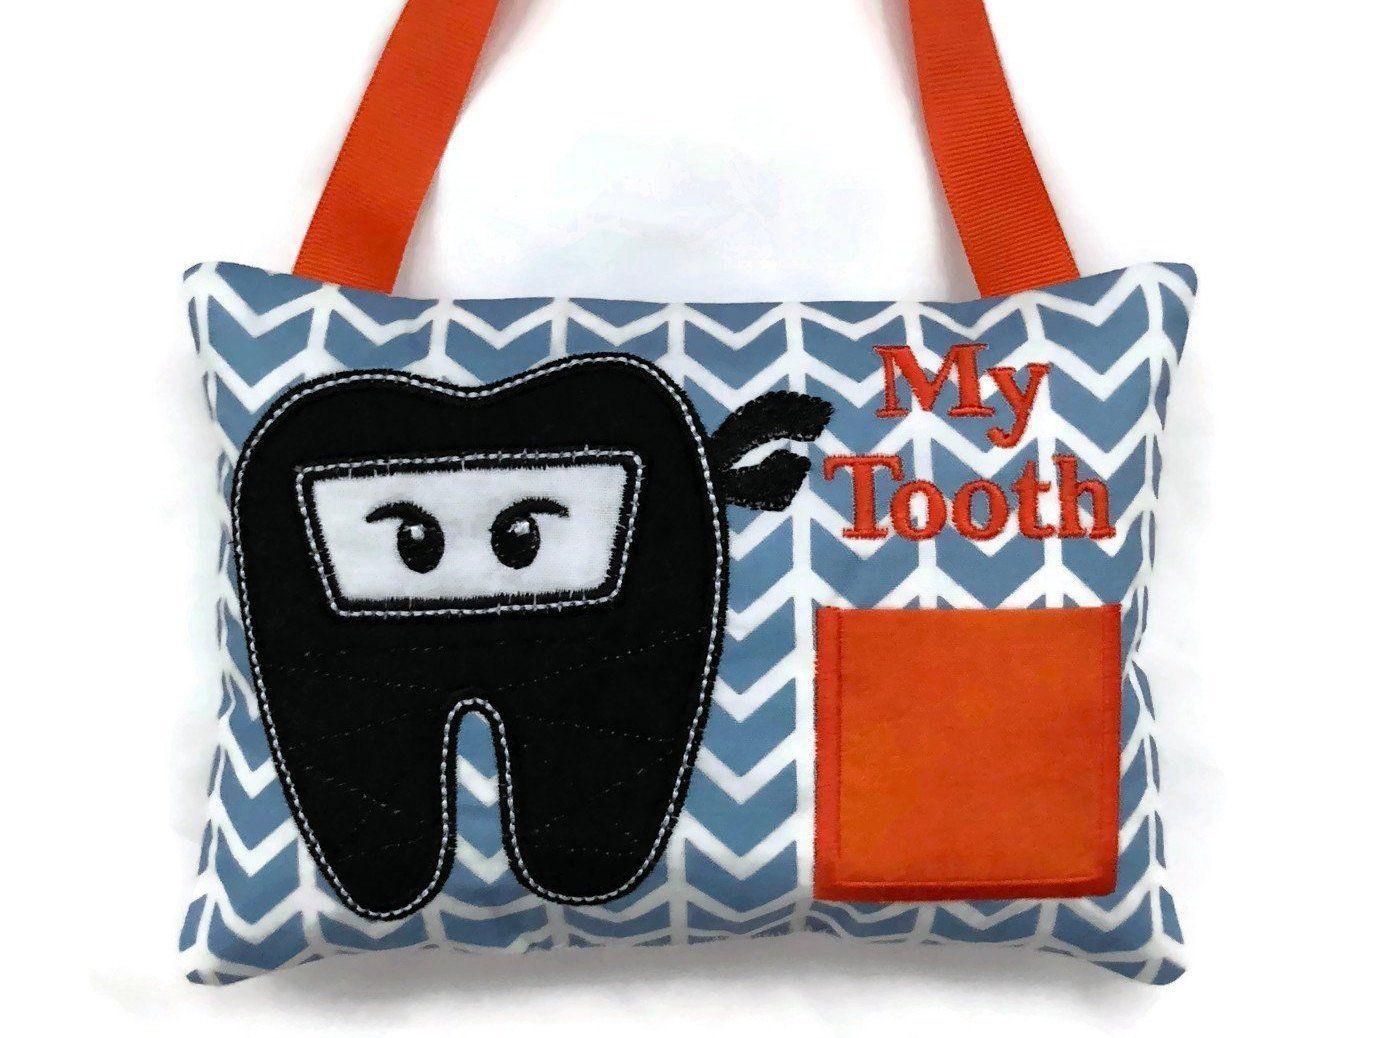 ninja tooth fairy pillow boys tooth